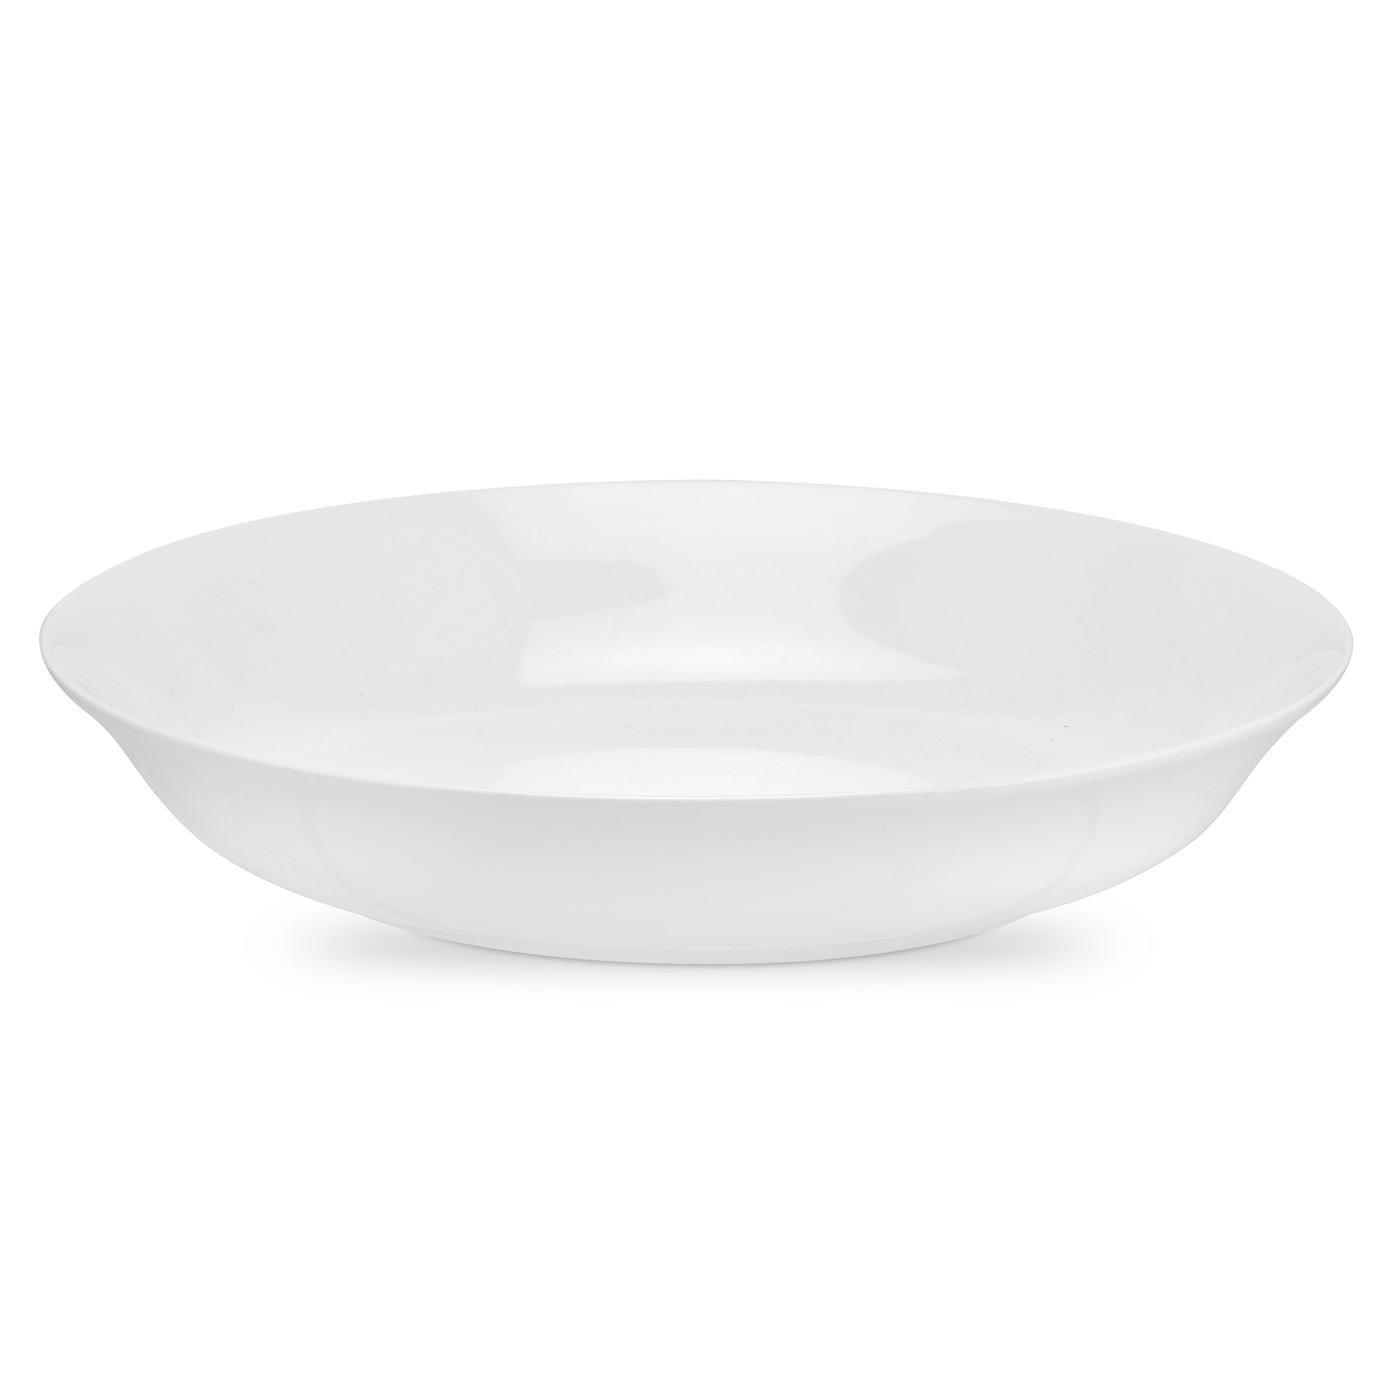 Royal Worcester Serendipity White Pasta Bowl